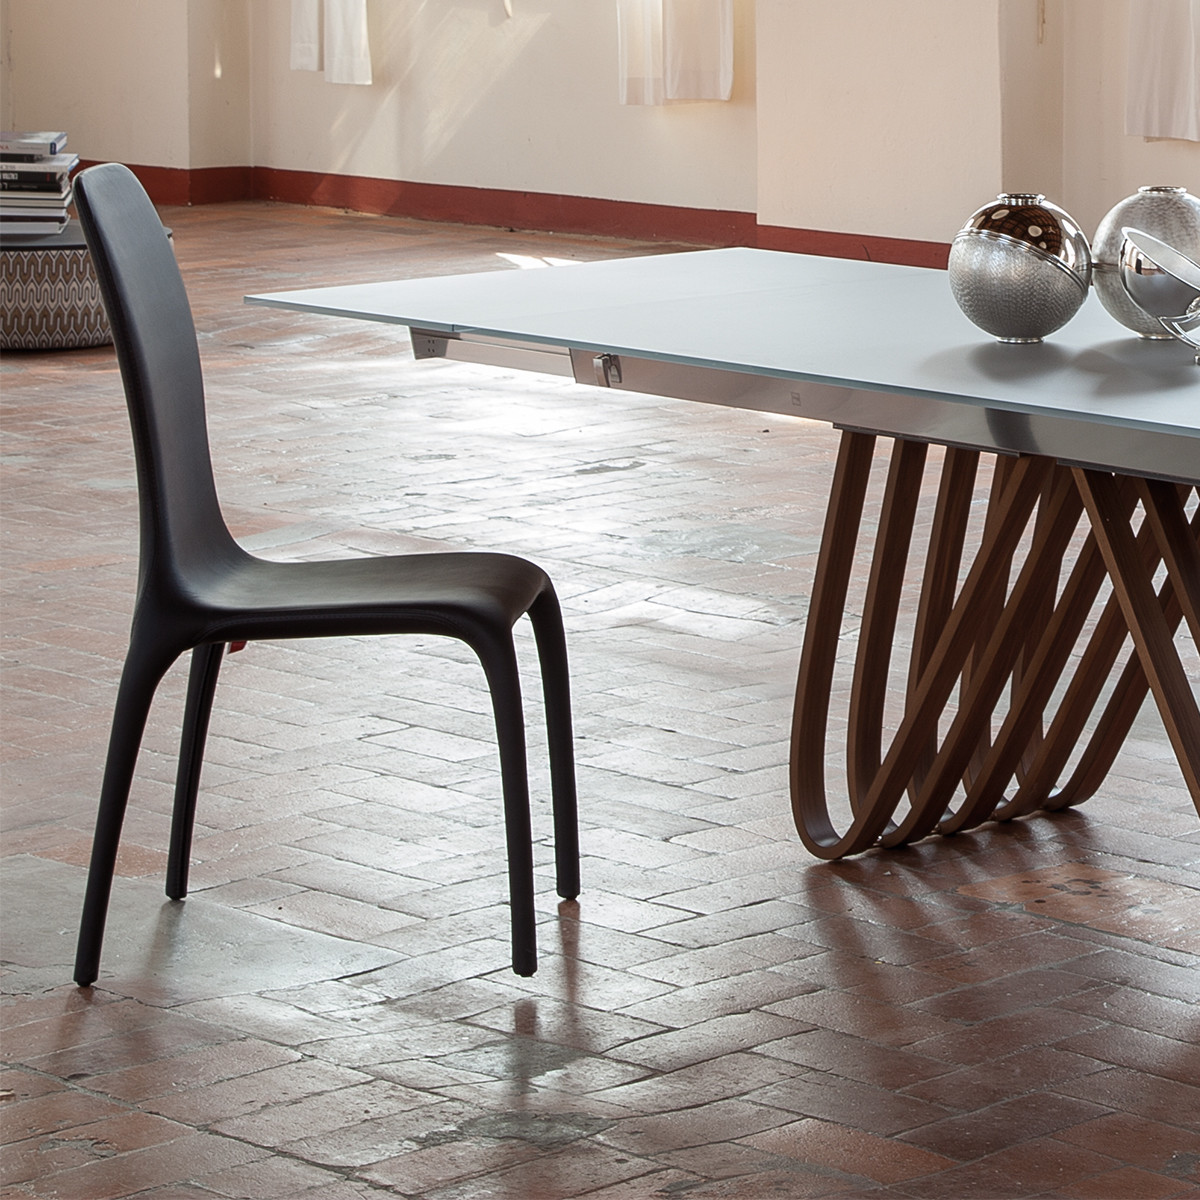 Tonin Casa LISETTA 7200 Stuhl Mit Lederbezug